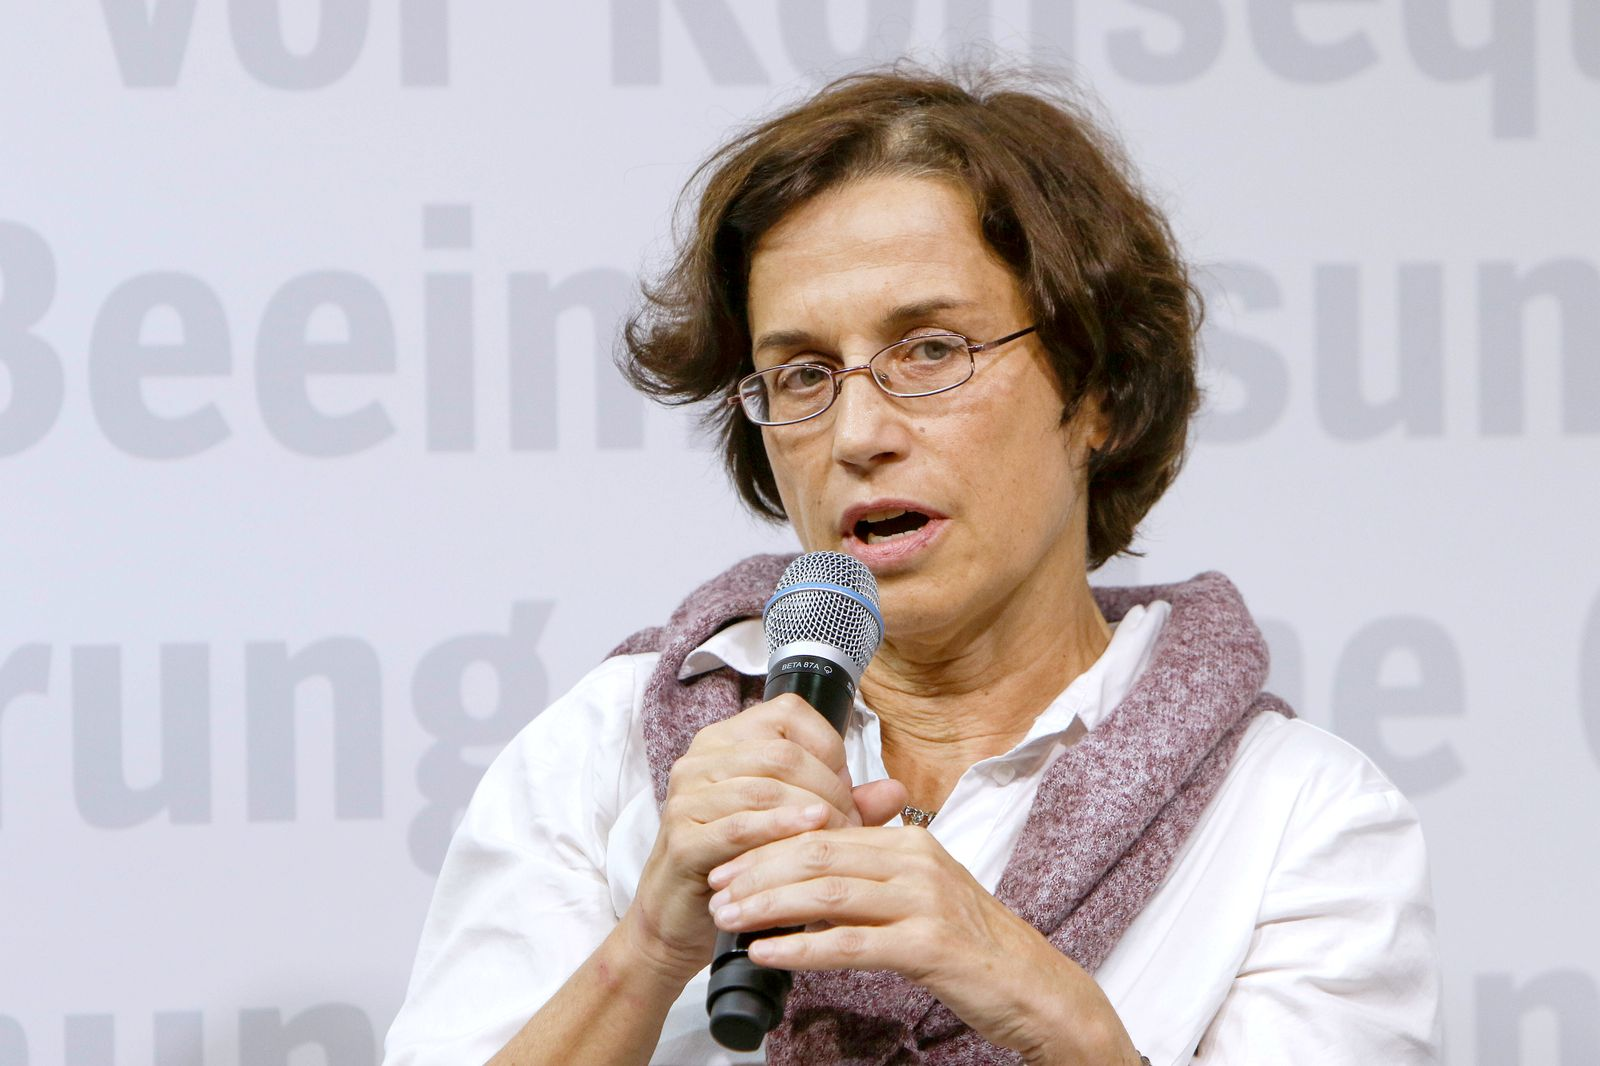 Germany: Frankfurt Book Fair 2019 Day 1 German sociologist Cornelia Koppetsch speaks at the Frankfurt Book Fair. The 71t